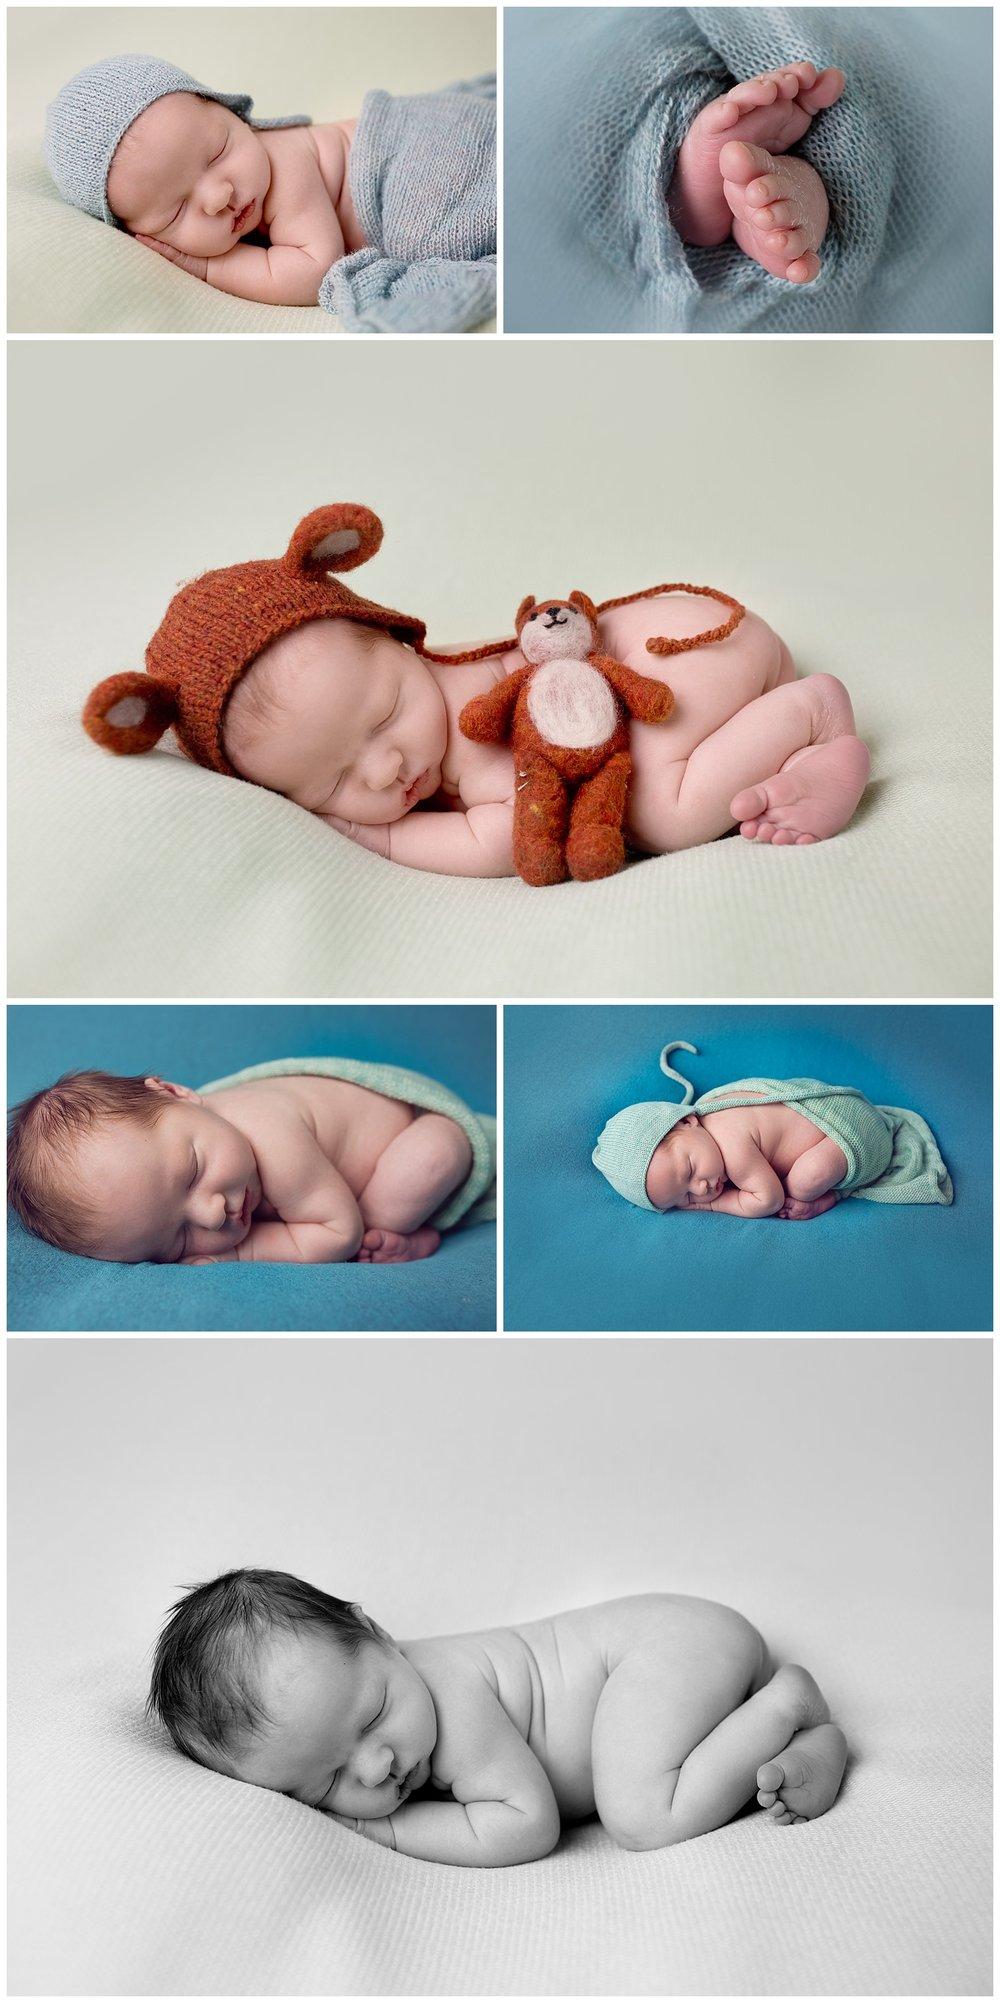 Raleigh Wake Forest Newborn Photography 02_3.jpg